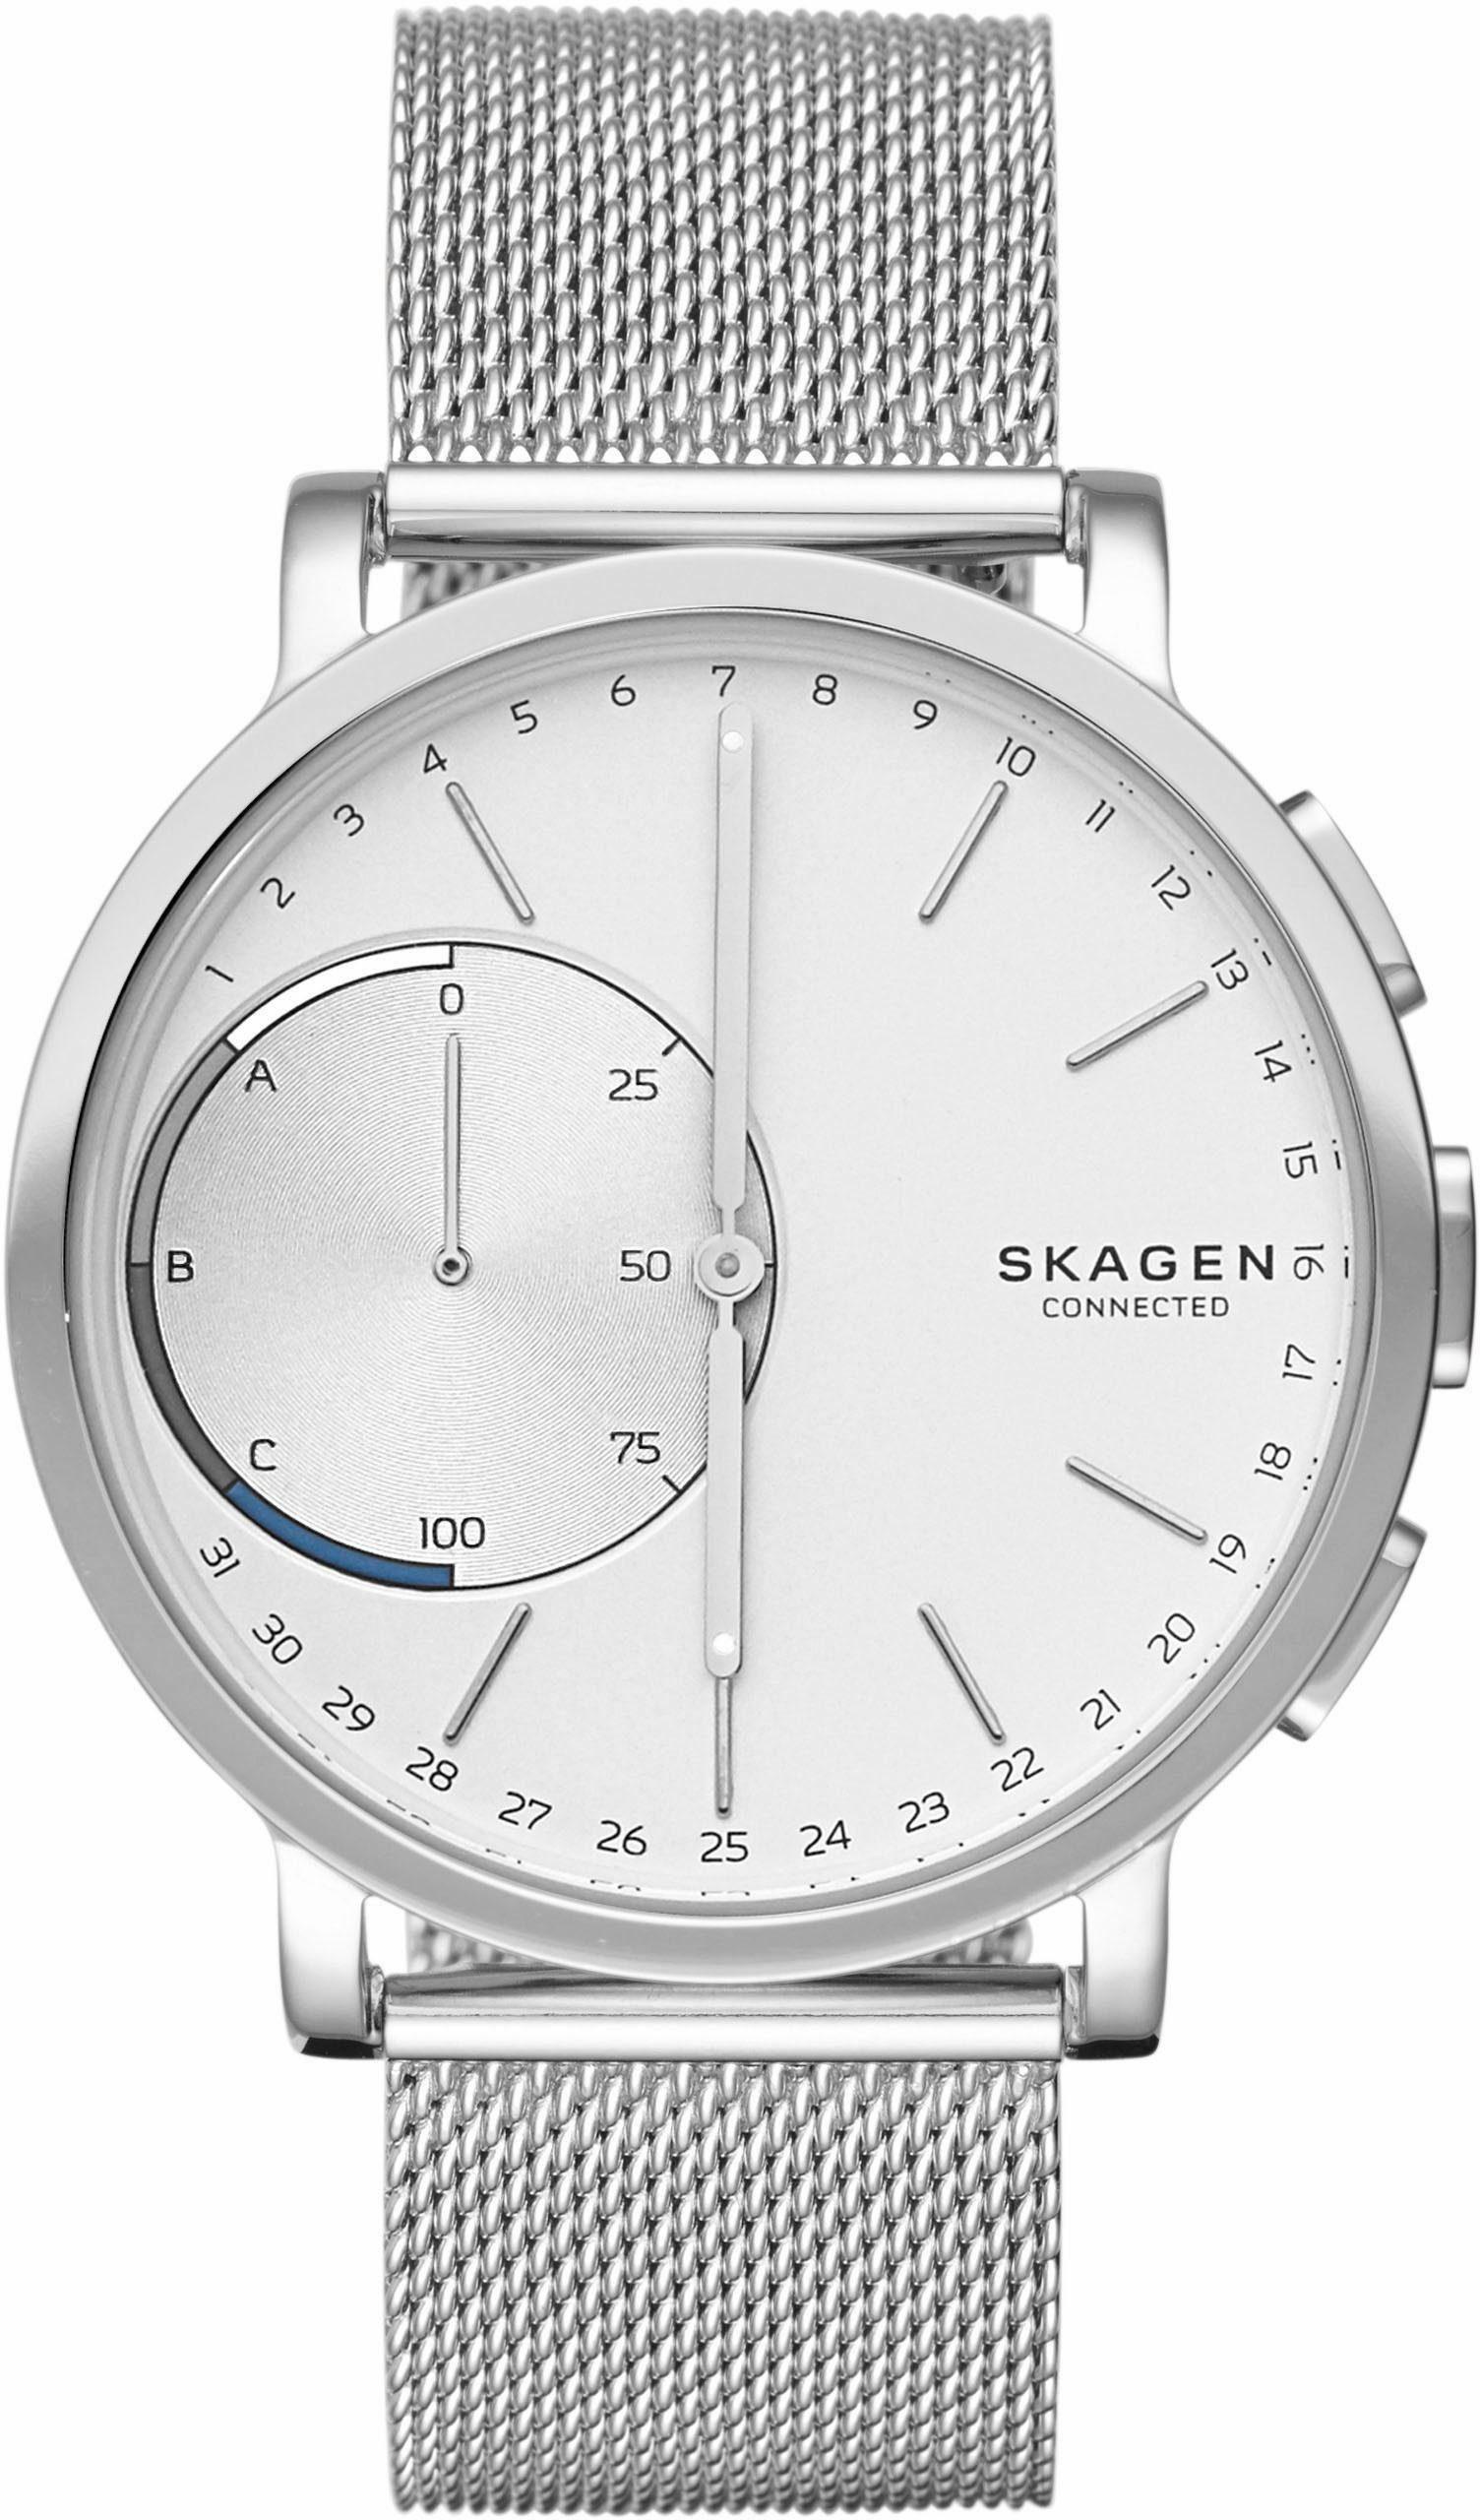 SKAGEN CONNECTED HAGEN CONNECTED, SKT1100 Smartwatch (Android Wear)